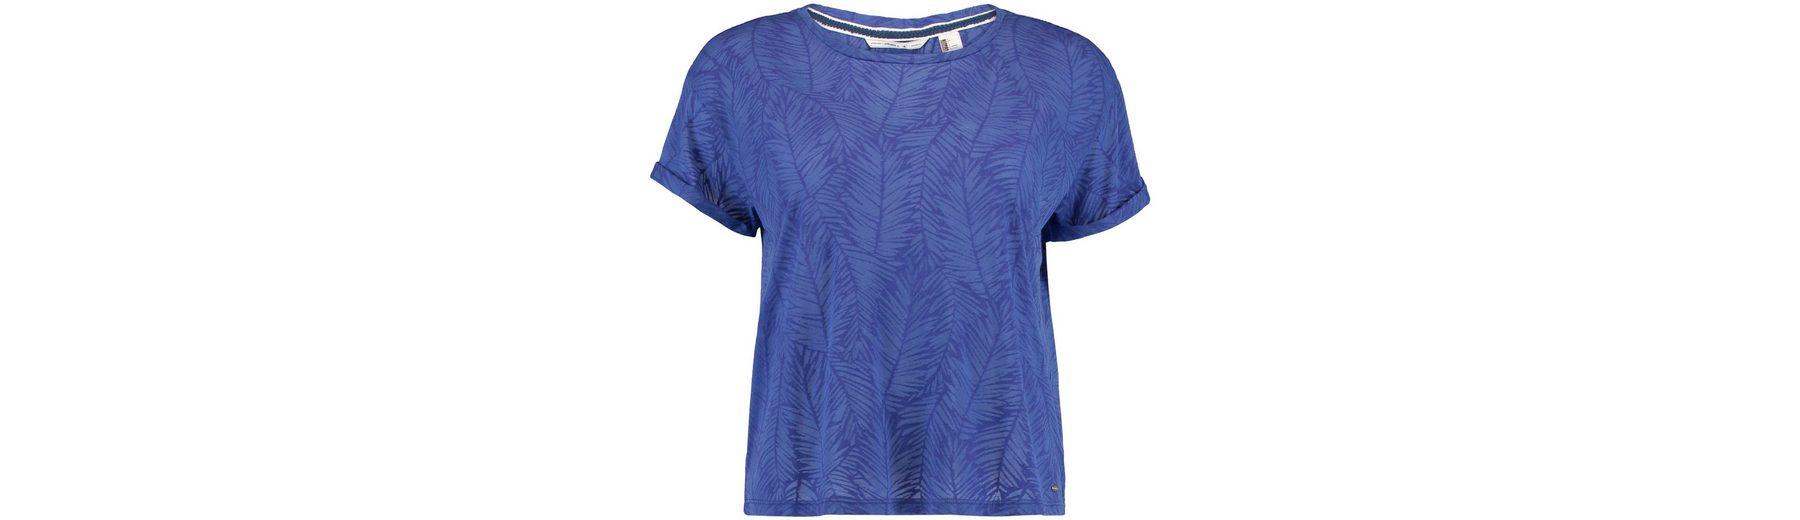 O'Neill T-Shirts kurzärmlig Crop split back t-shirt Rabatt Professionelle 2018 Auslaß Sneakernews Verkauf Online ts28L8d2